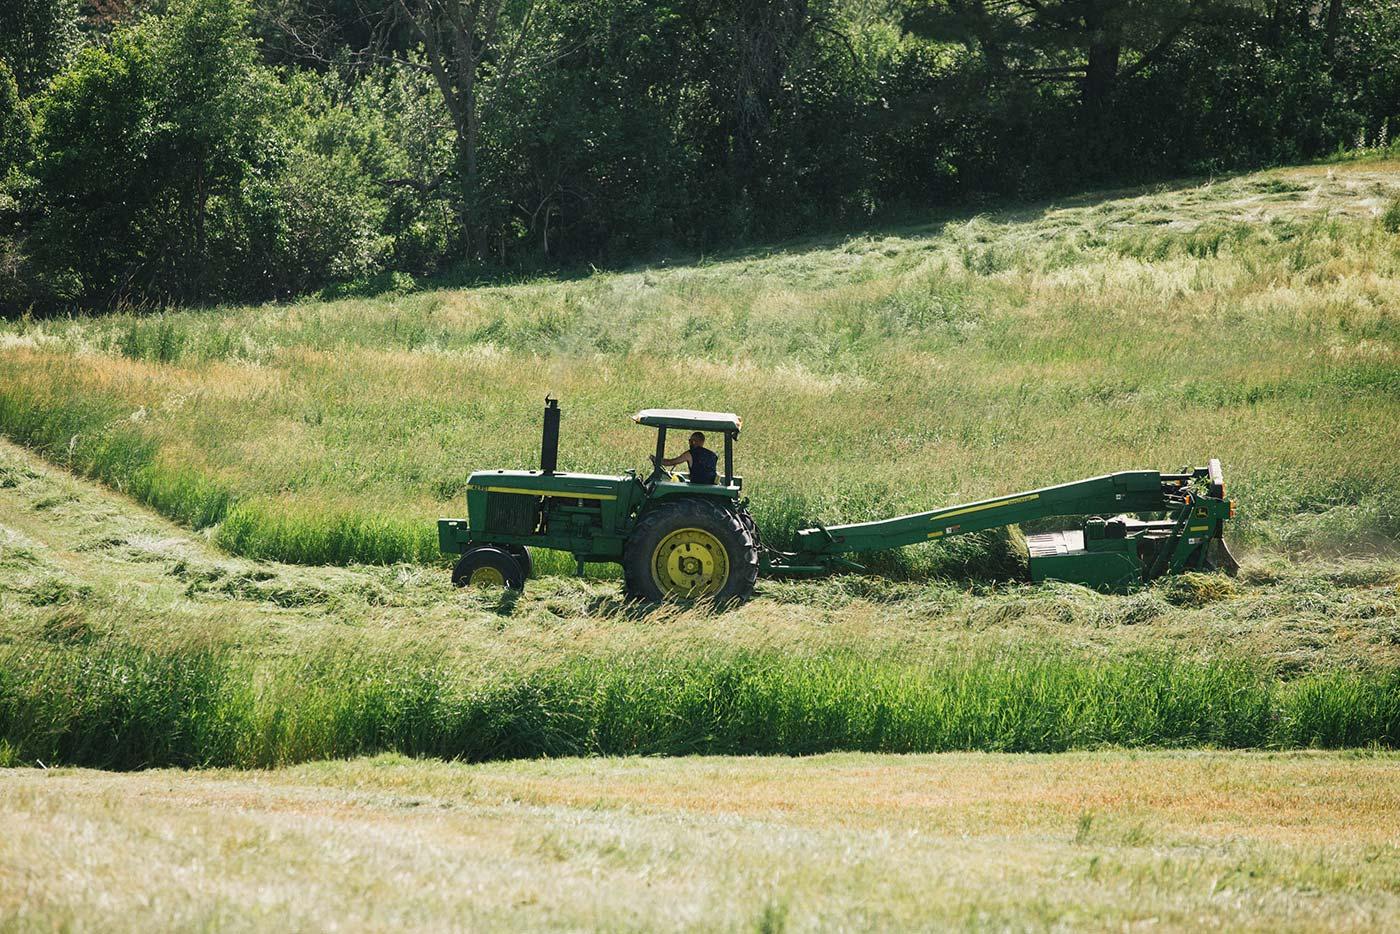 https://www.oakhurstdairy.com/wp-content/uploads/2021/09/farmer-imgs-halledge2-150x150.jpg